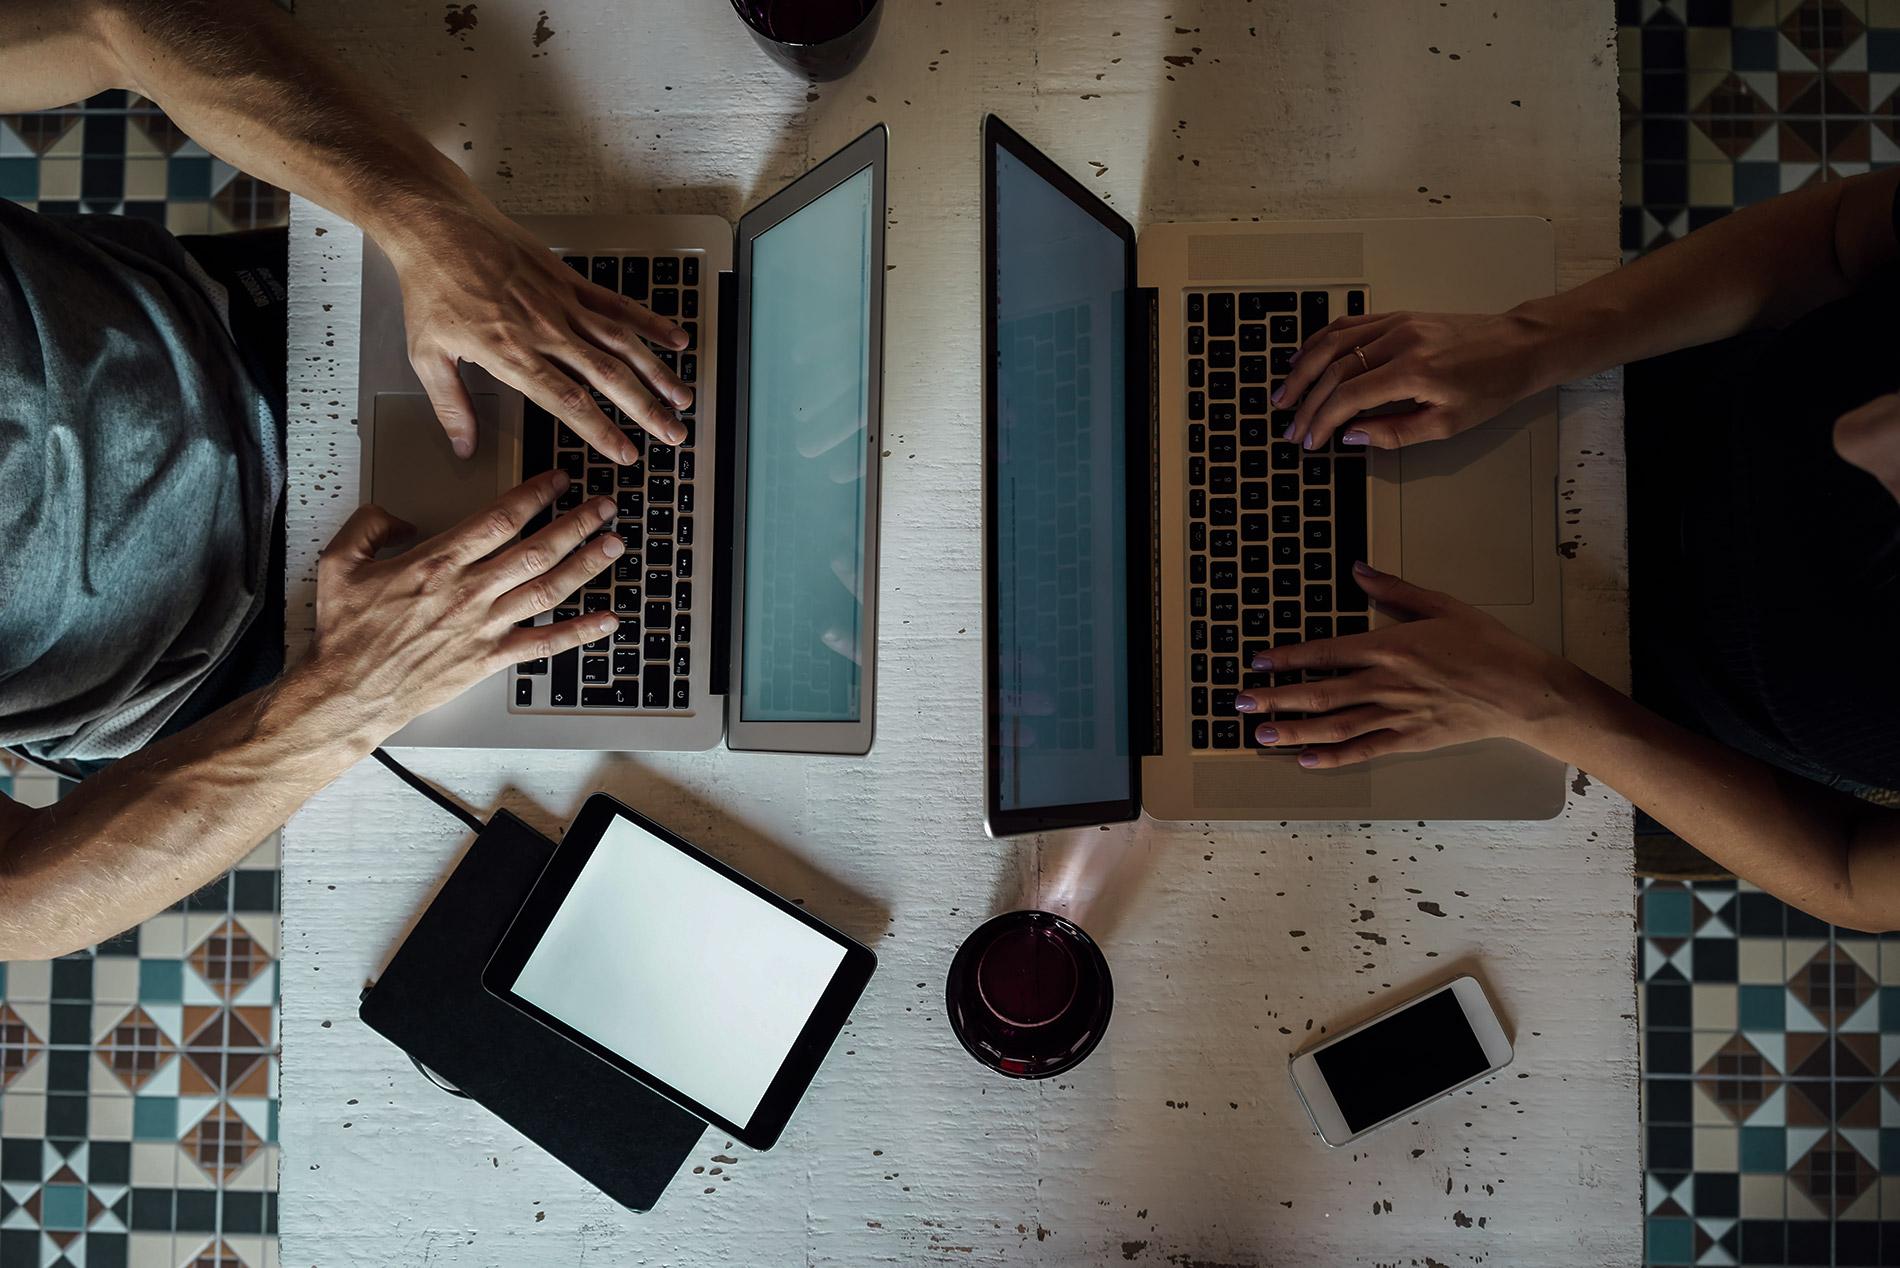 Man-Woman-Working-on-Computer_AdobeStock_102530896